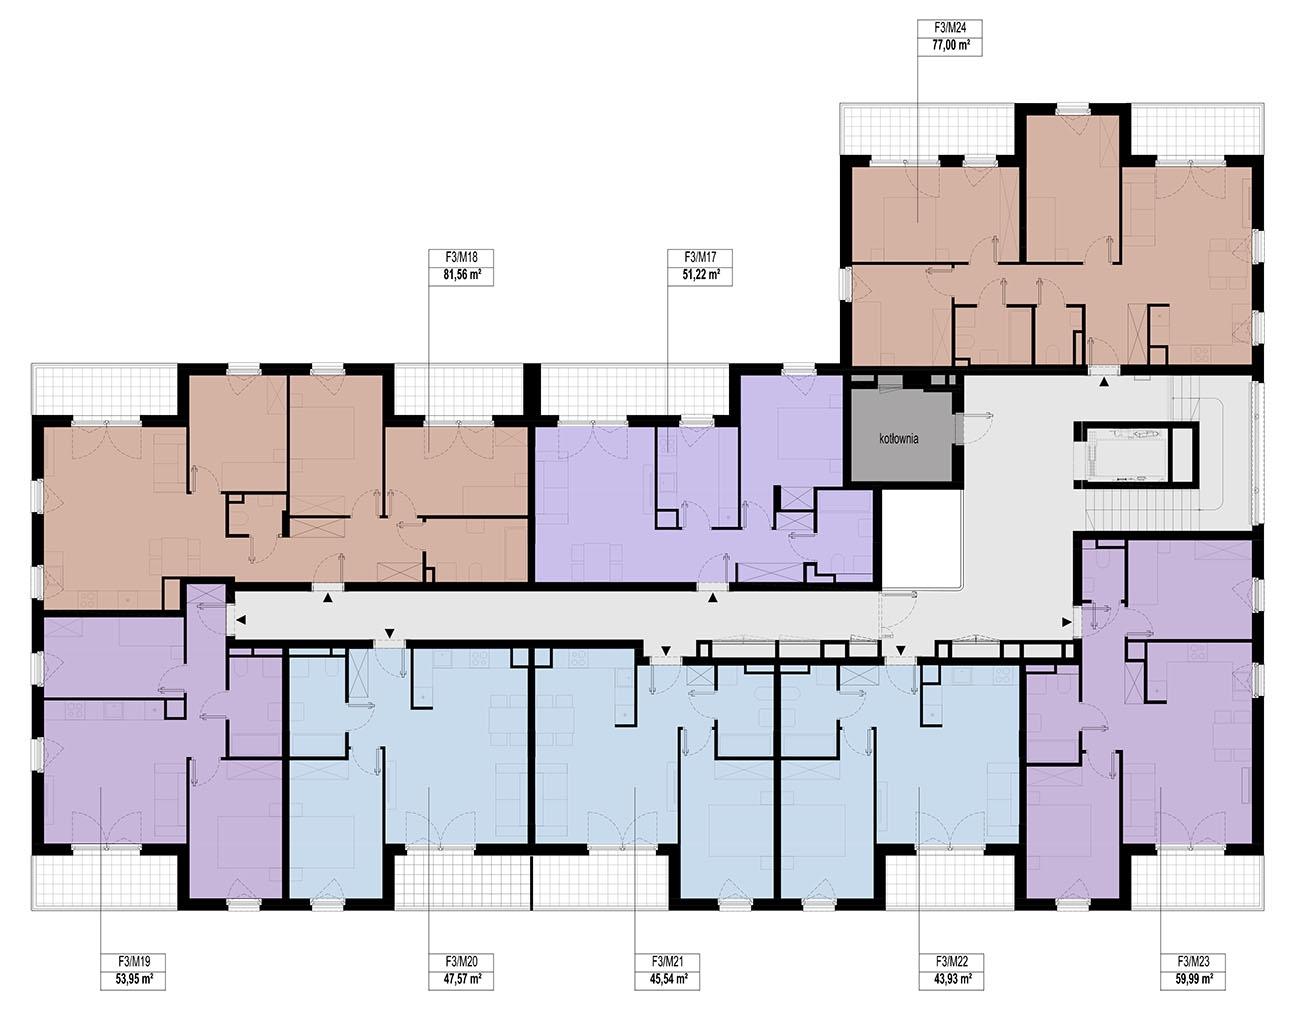 Etap 3 - Budynek F - Piętro 2